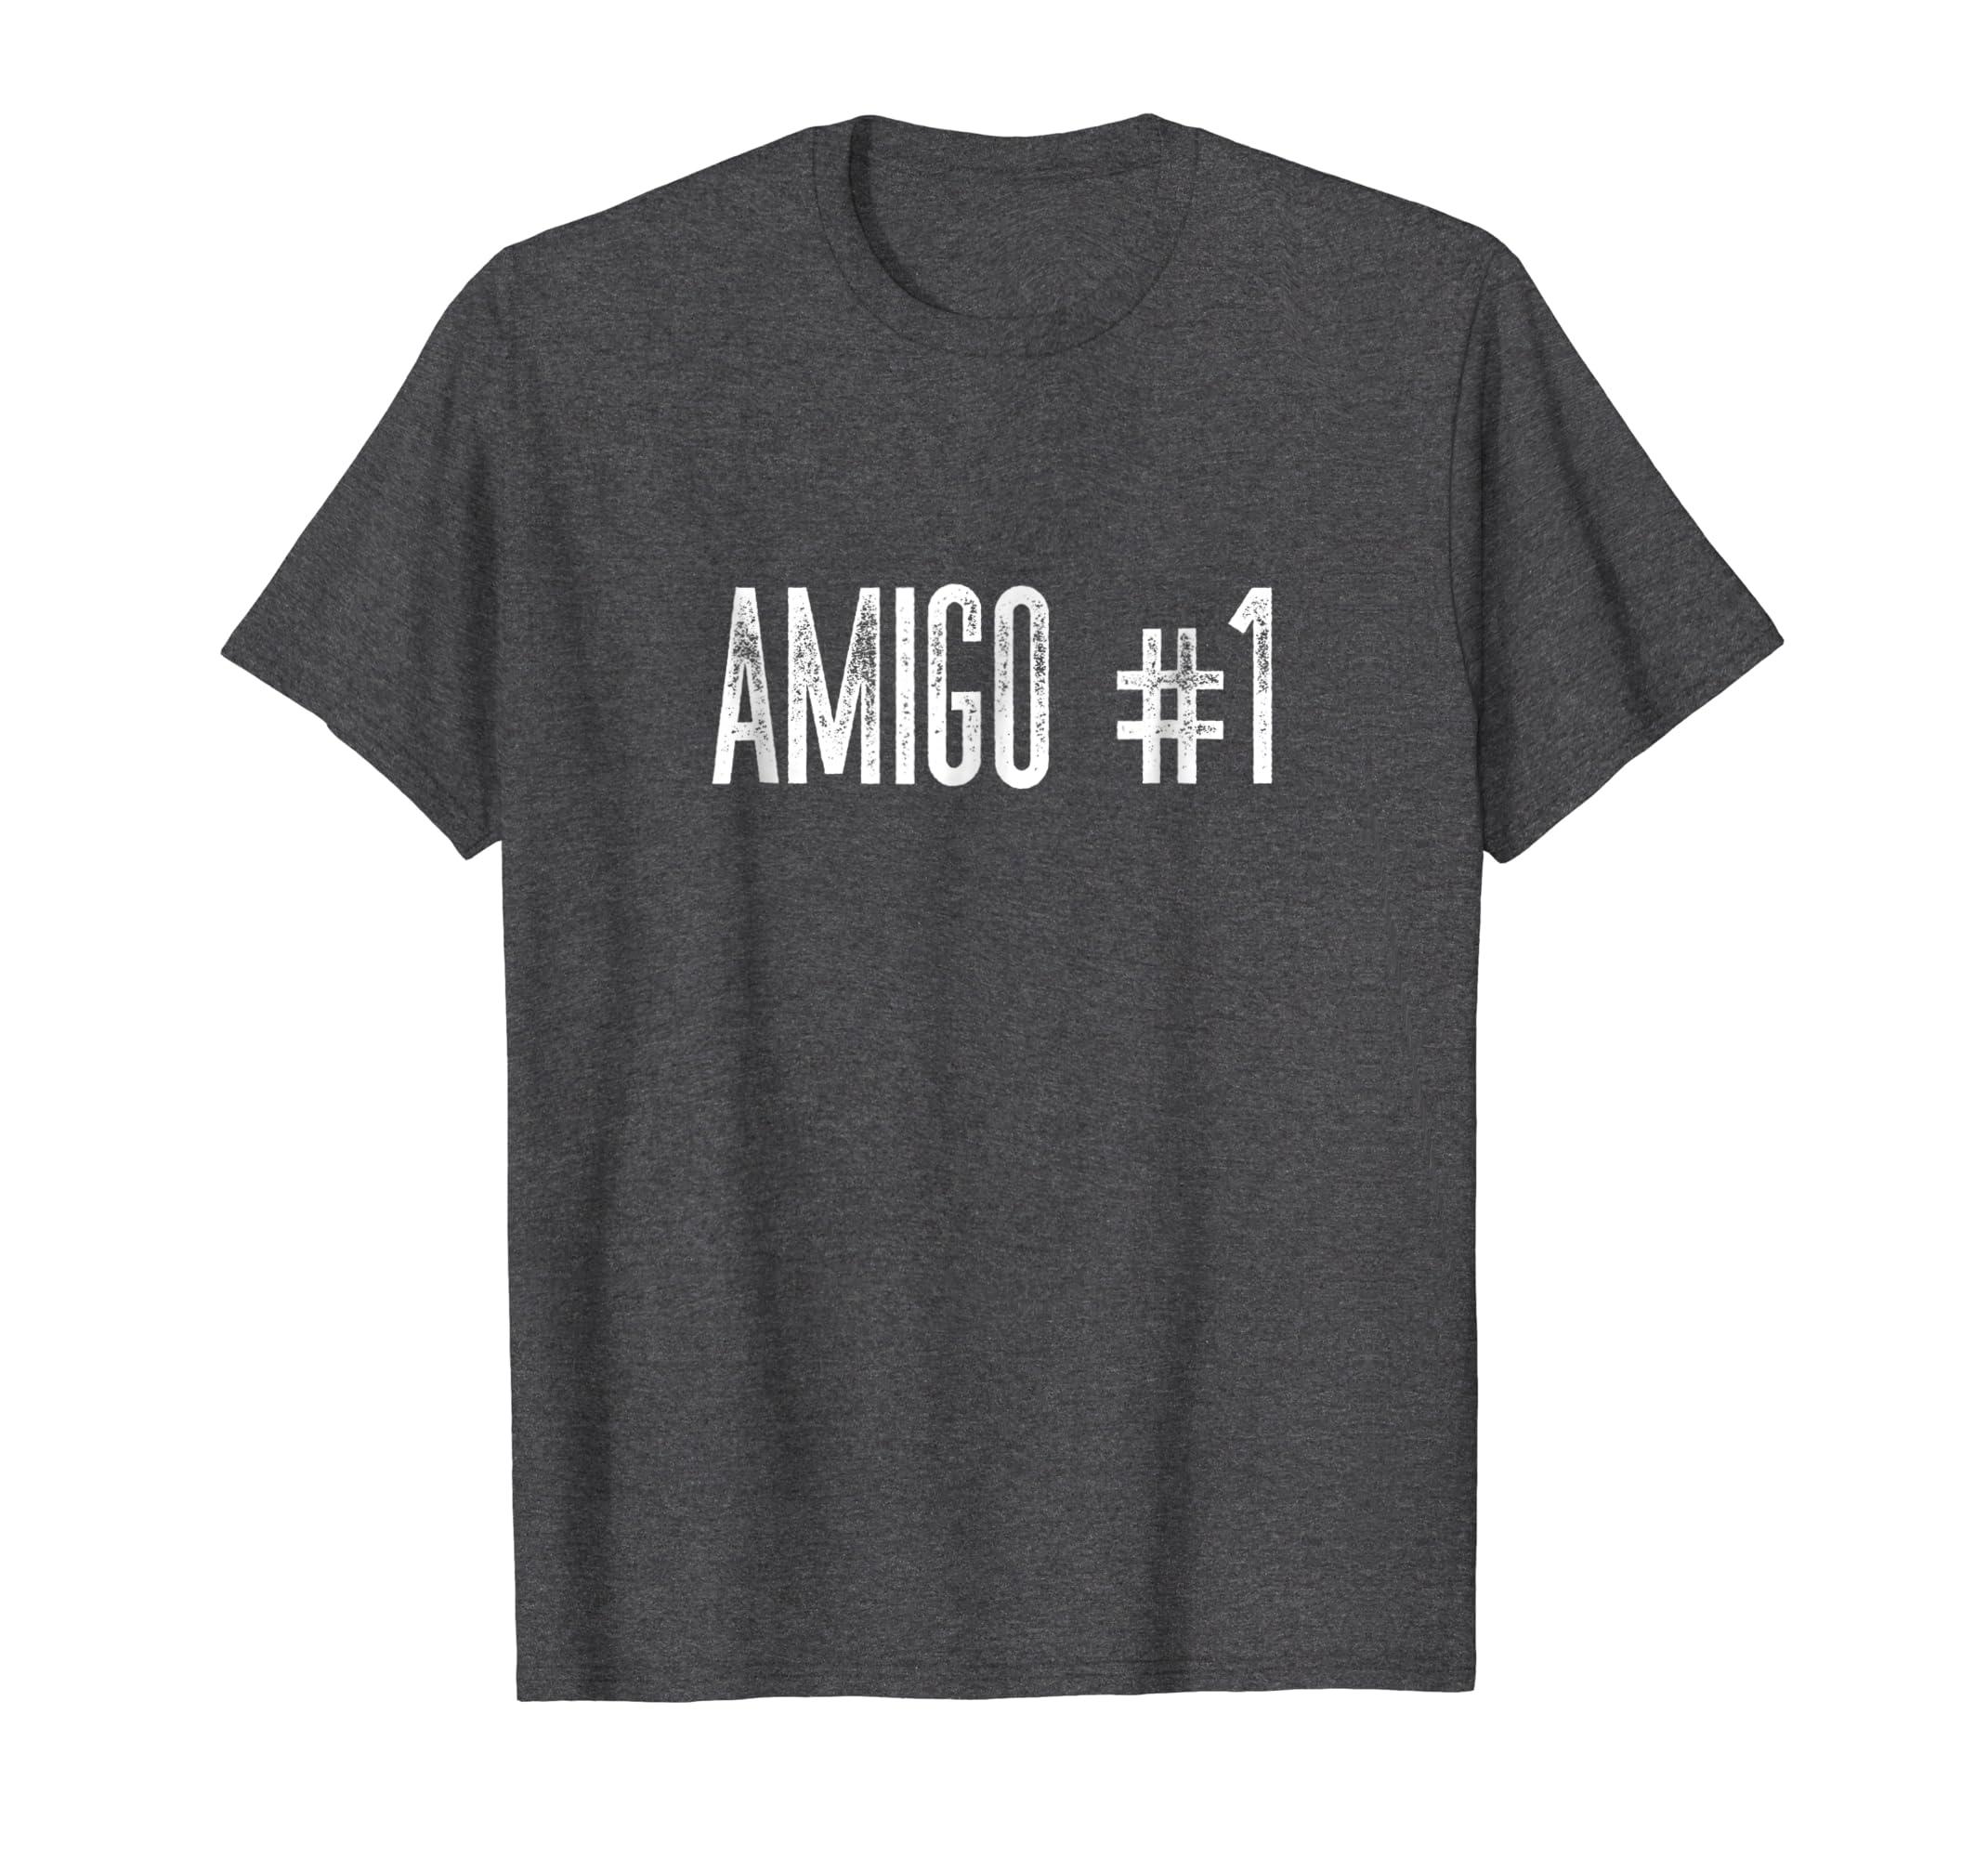 Amigo #1 Funny Halloween Group Costume Idea for Friends-ln